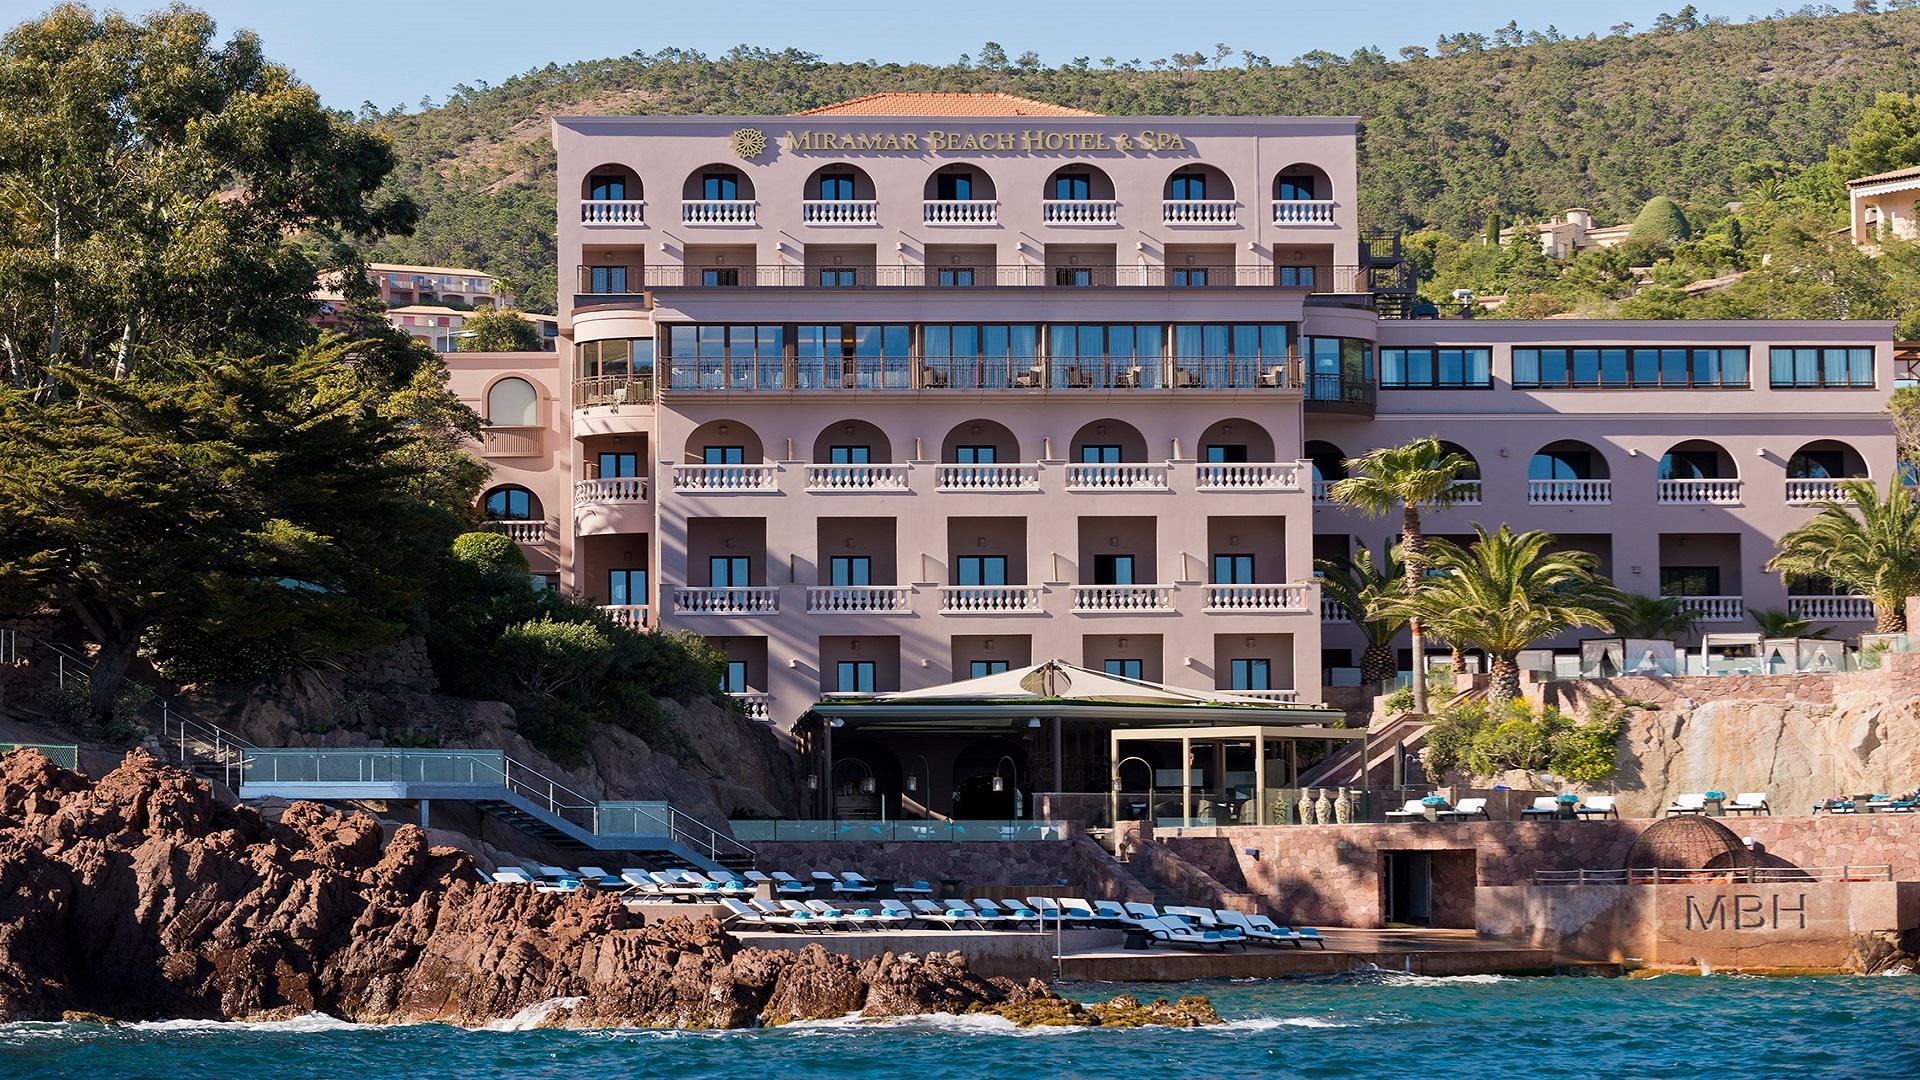 Tiara Miramar beach hotel